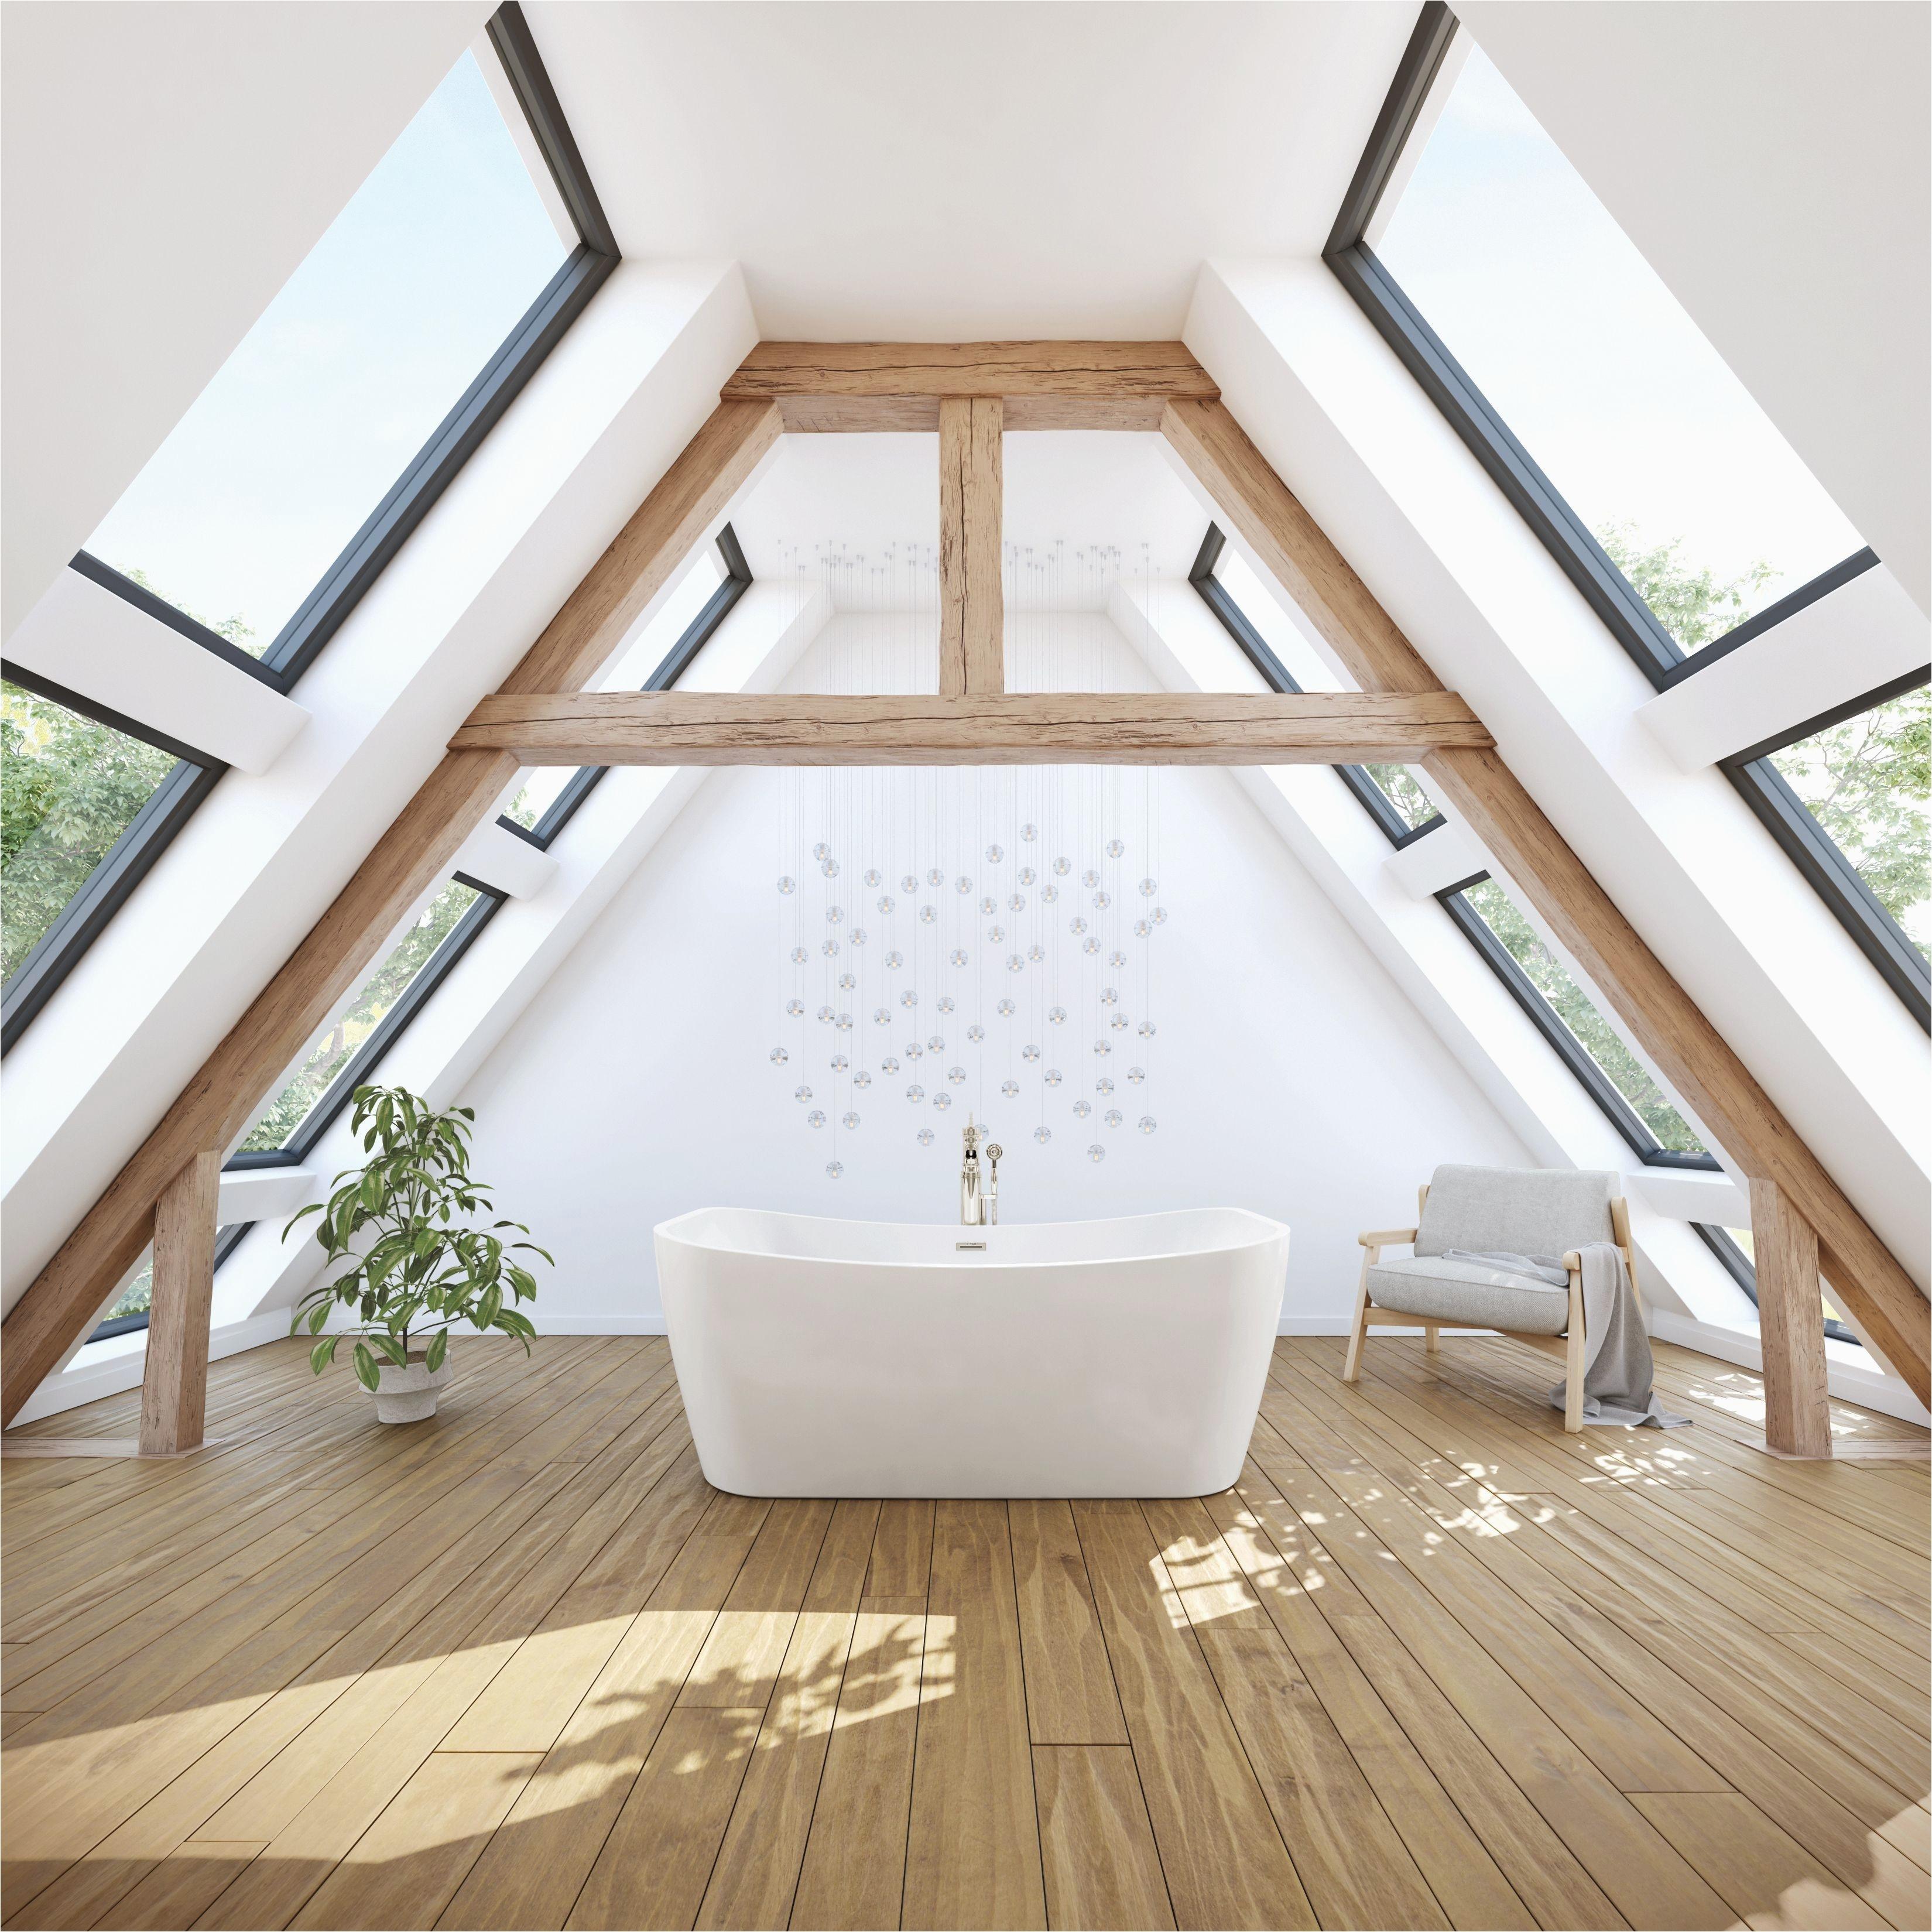 Bathtubs with Doors Bathtub Wall Surround Awesome Shower Door Ideas Fresh Enclosure 0d